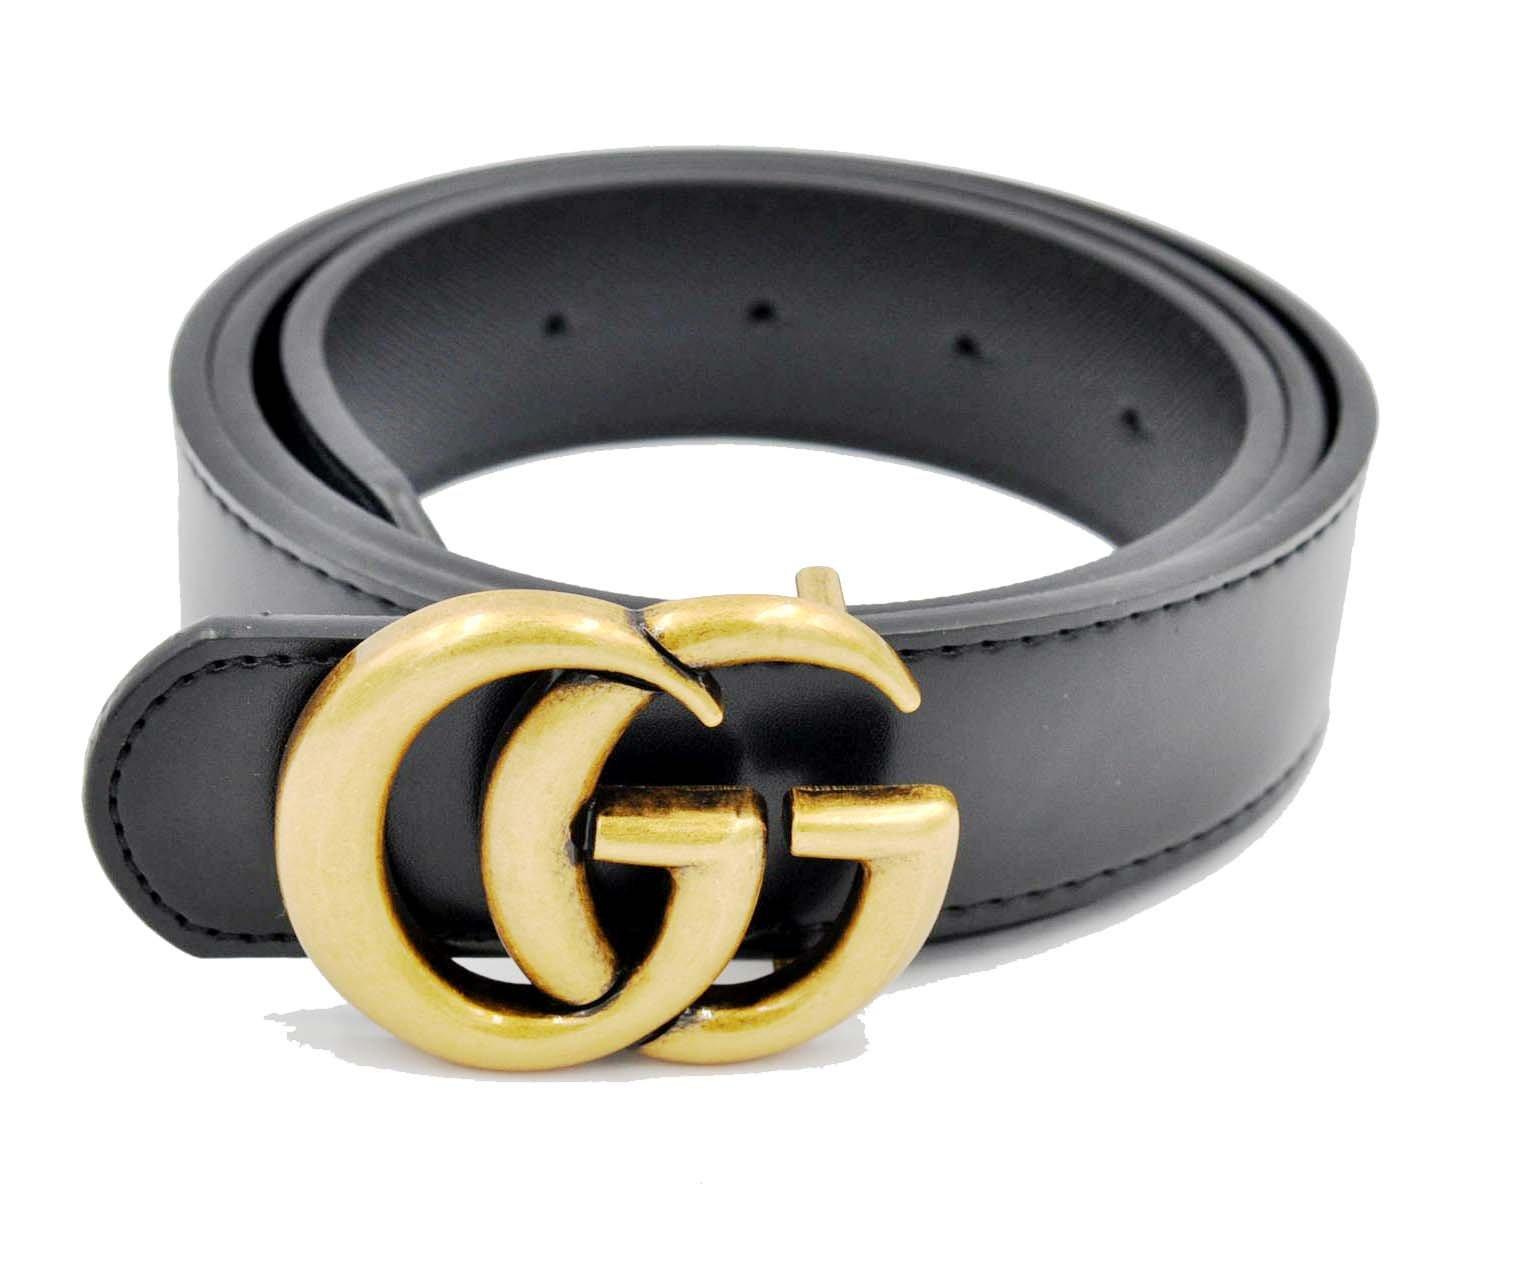 Luxury Designer GG Slim Belt for Women [3.2CM width] (Copper Buckle, 115CM [Waist 33''~35''])